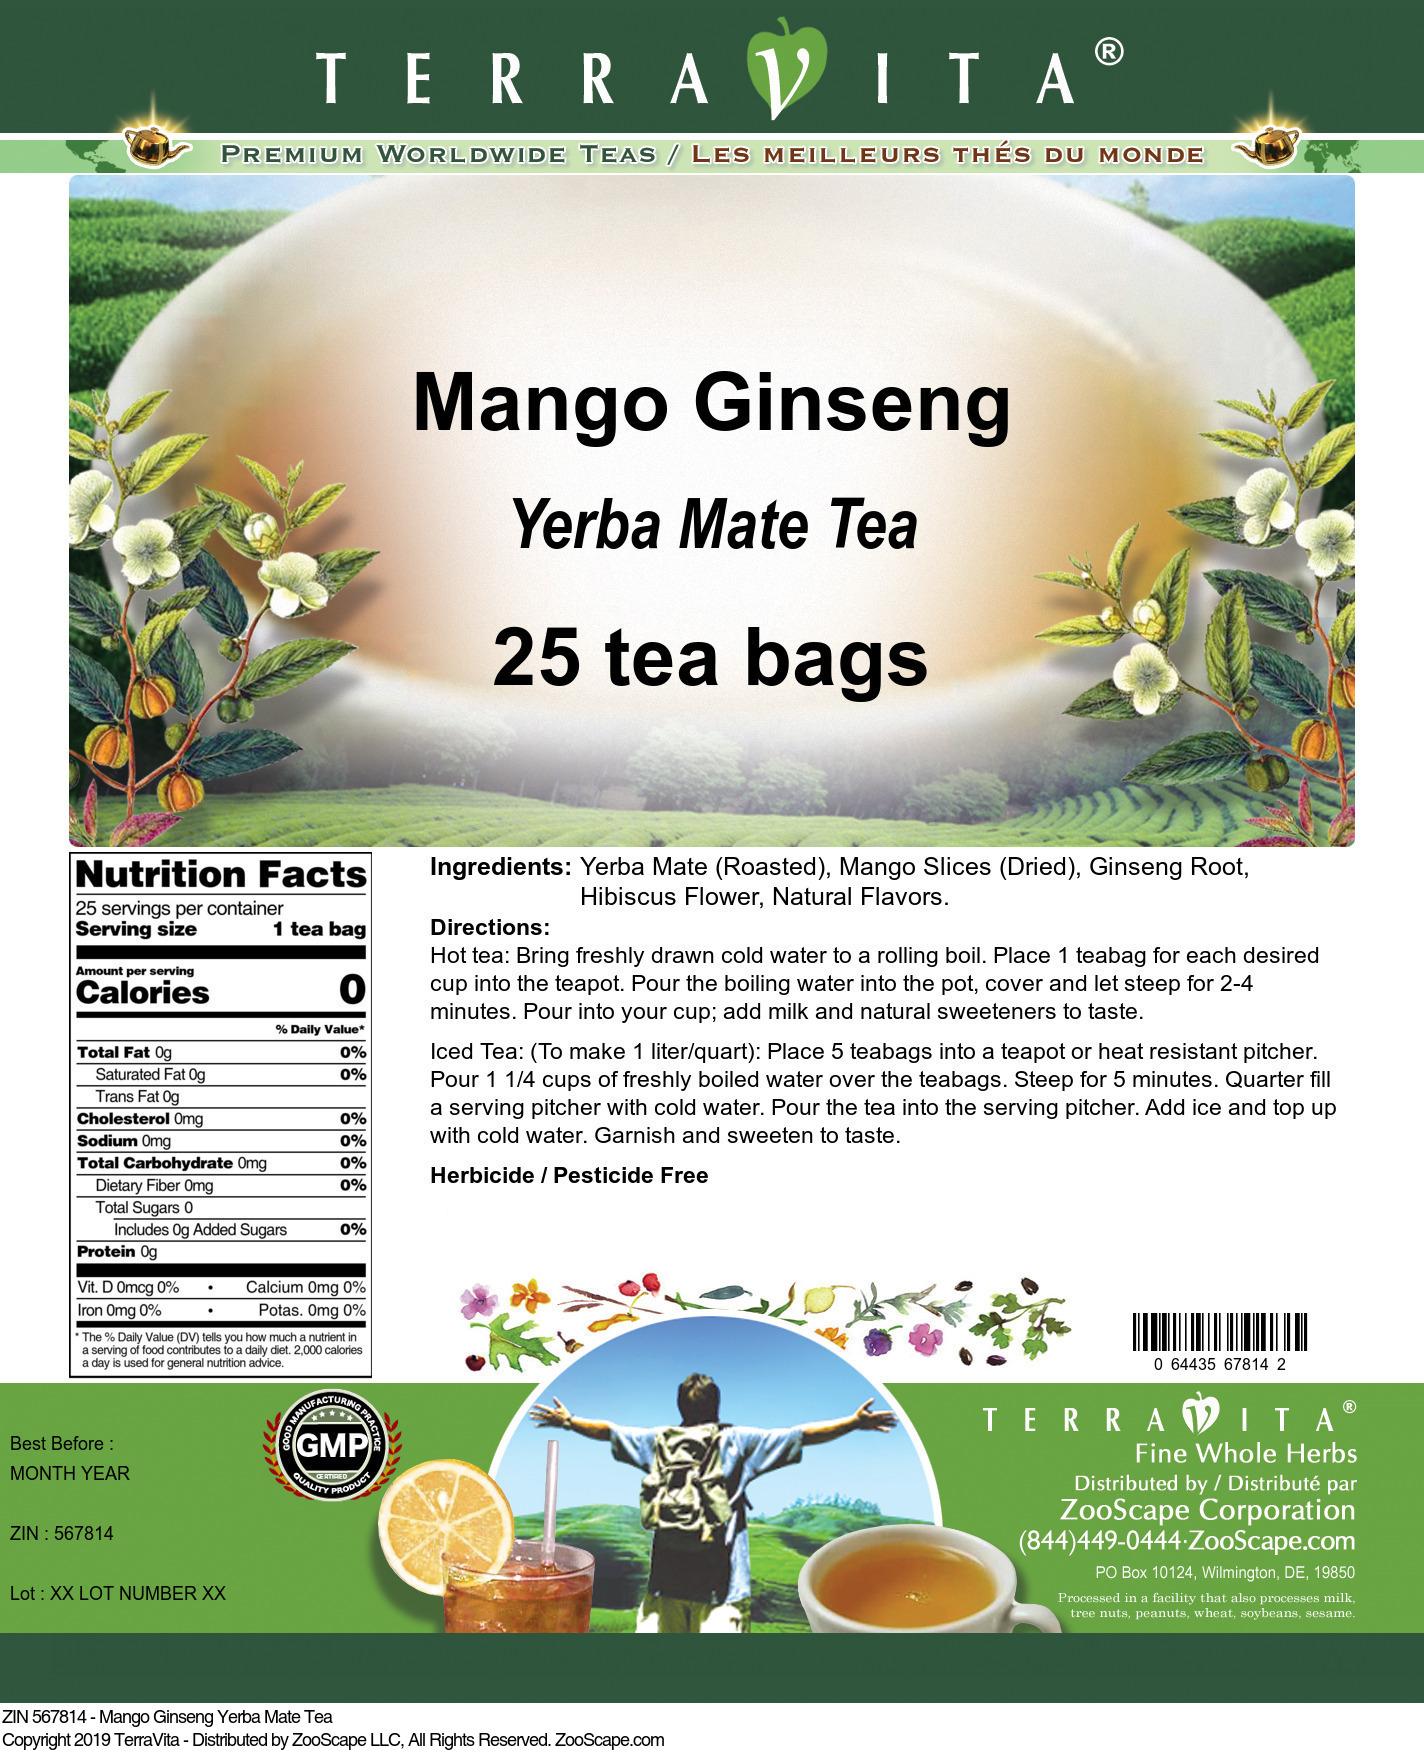 Mango Ginseng Yerba Mate Tea